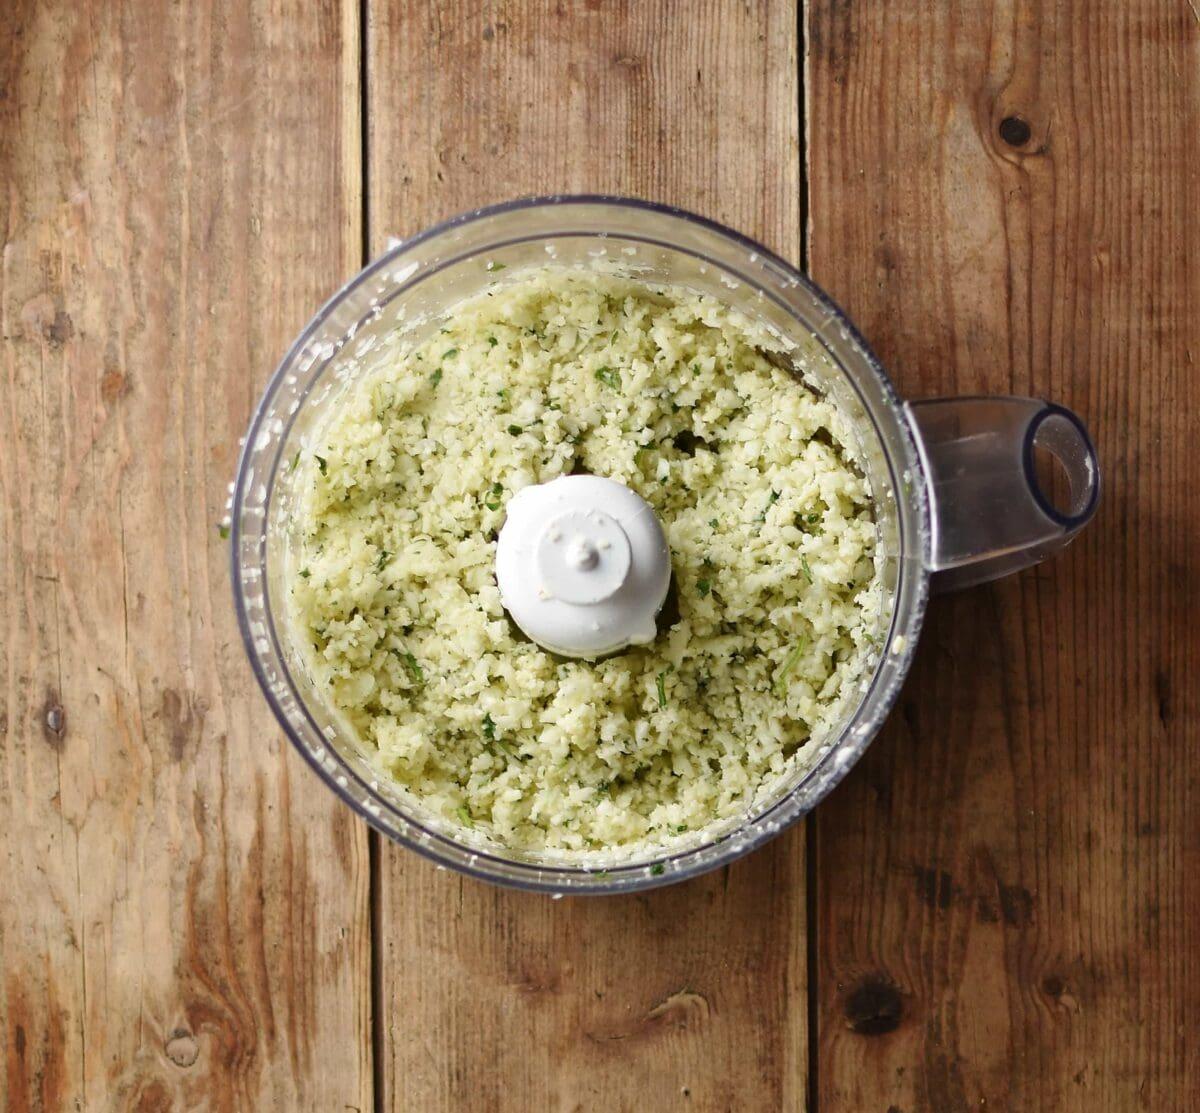 Cauliflower patties mixture inside blender.